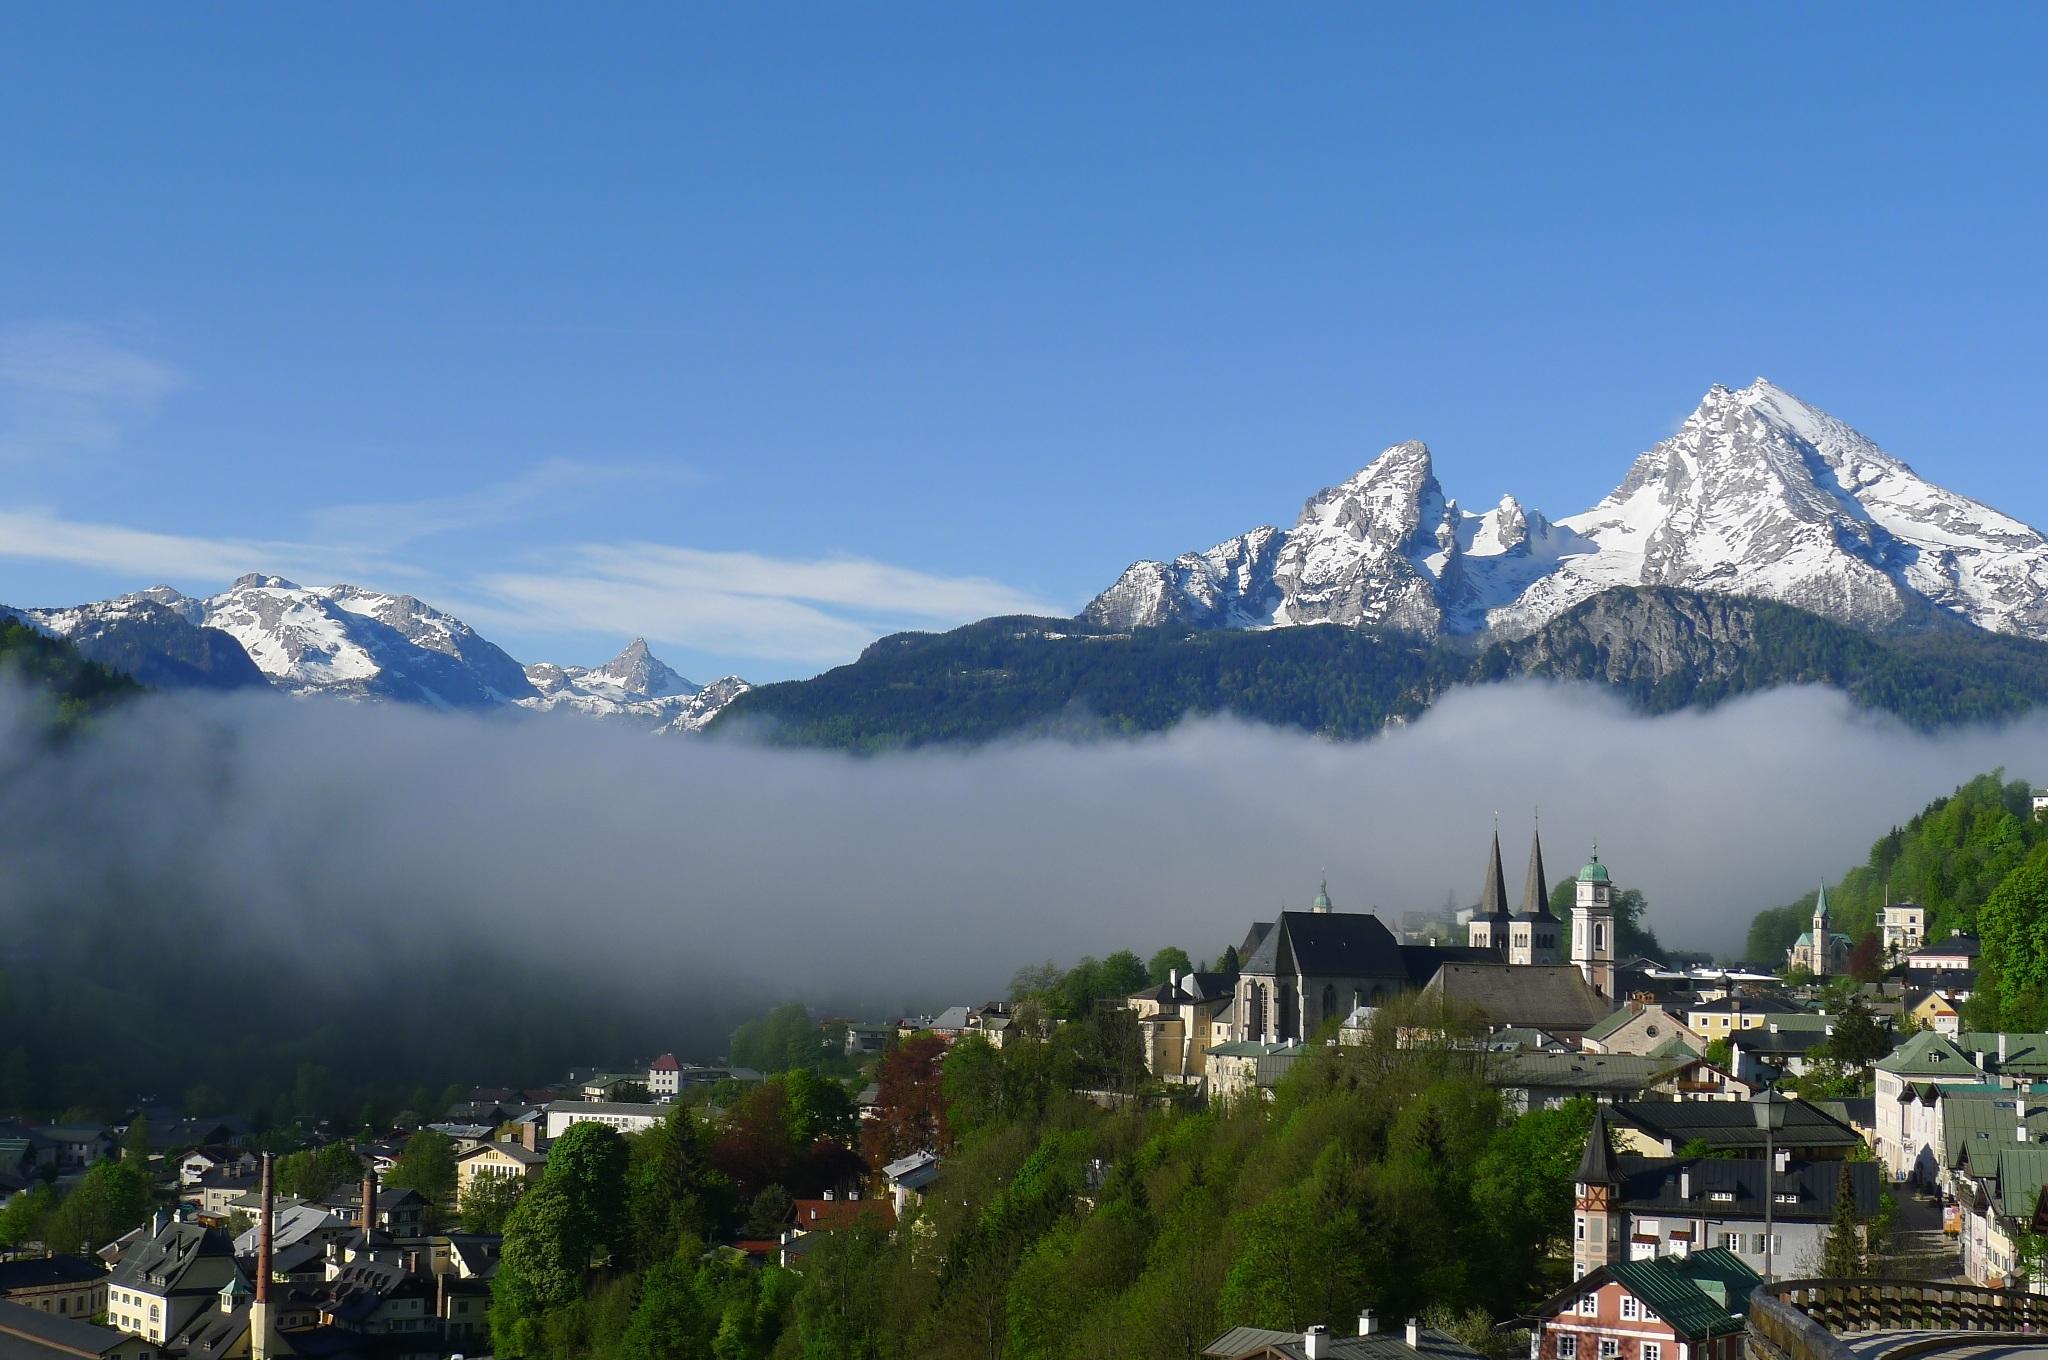 Kostenlose foto : Landschaft, Berg, Schnee, Nebel, Wandern ...